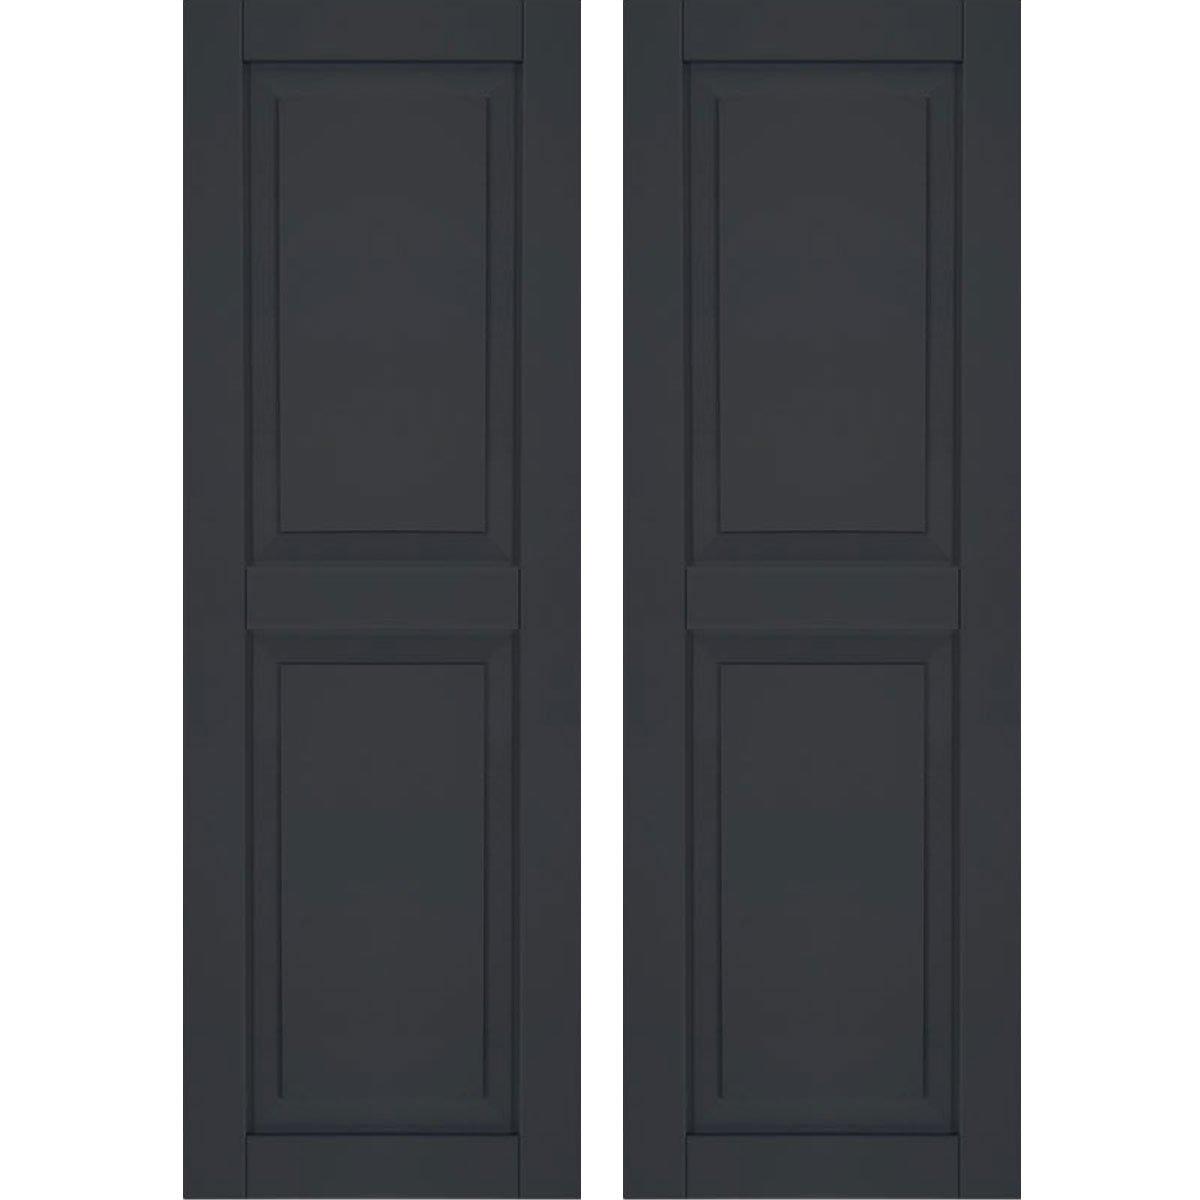 Ekena Millwork CWR15X072BLC Exterior Composite Wood